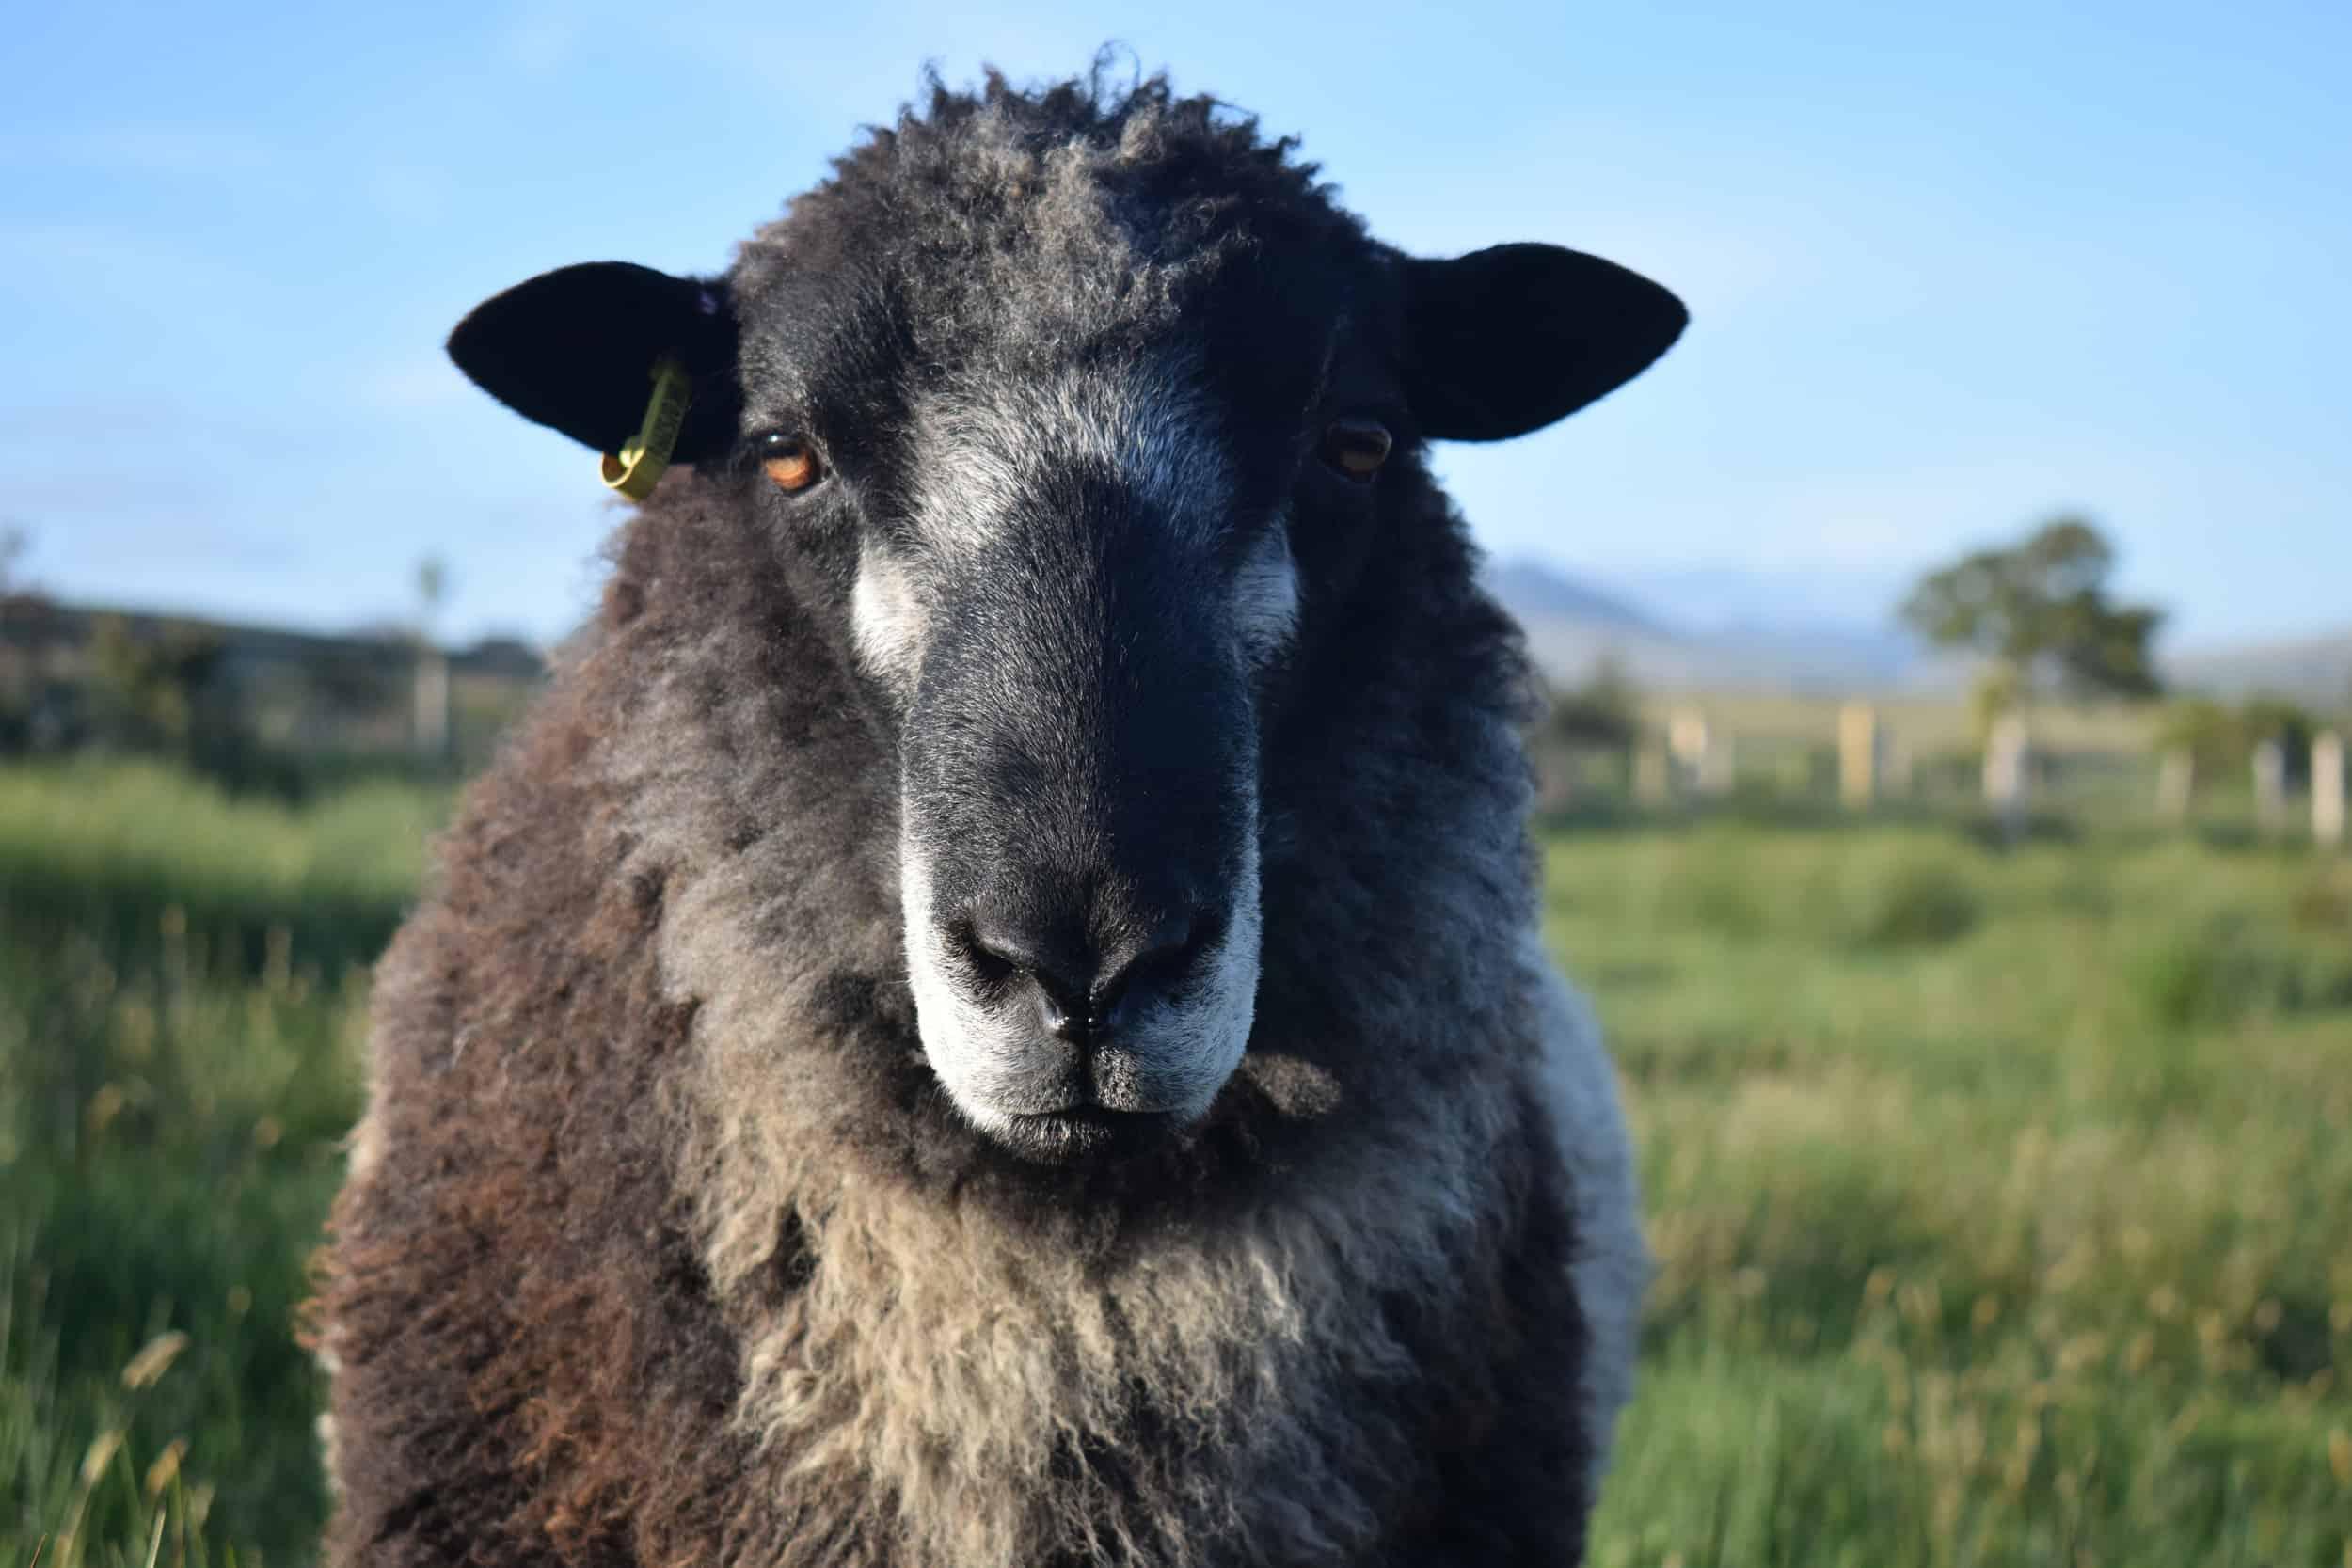 Bruno yearling ram coloured leicester longwool gotland shetland sheep crossbreed english blue kind fibre 2